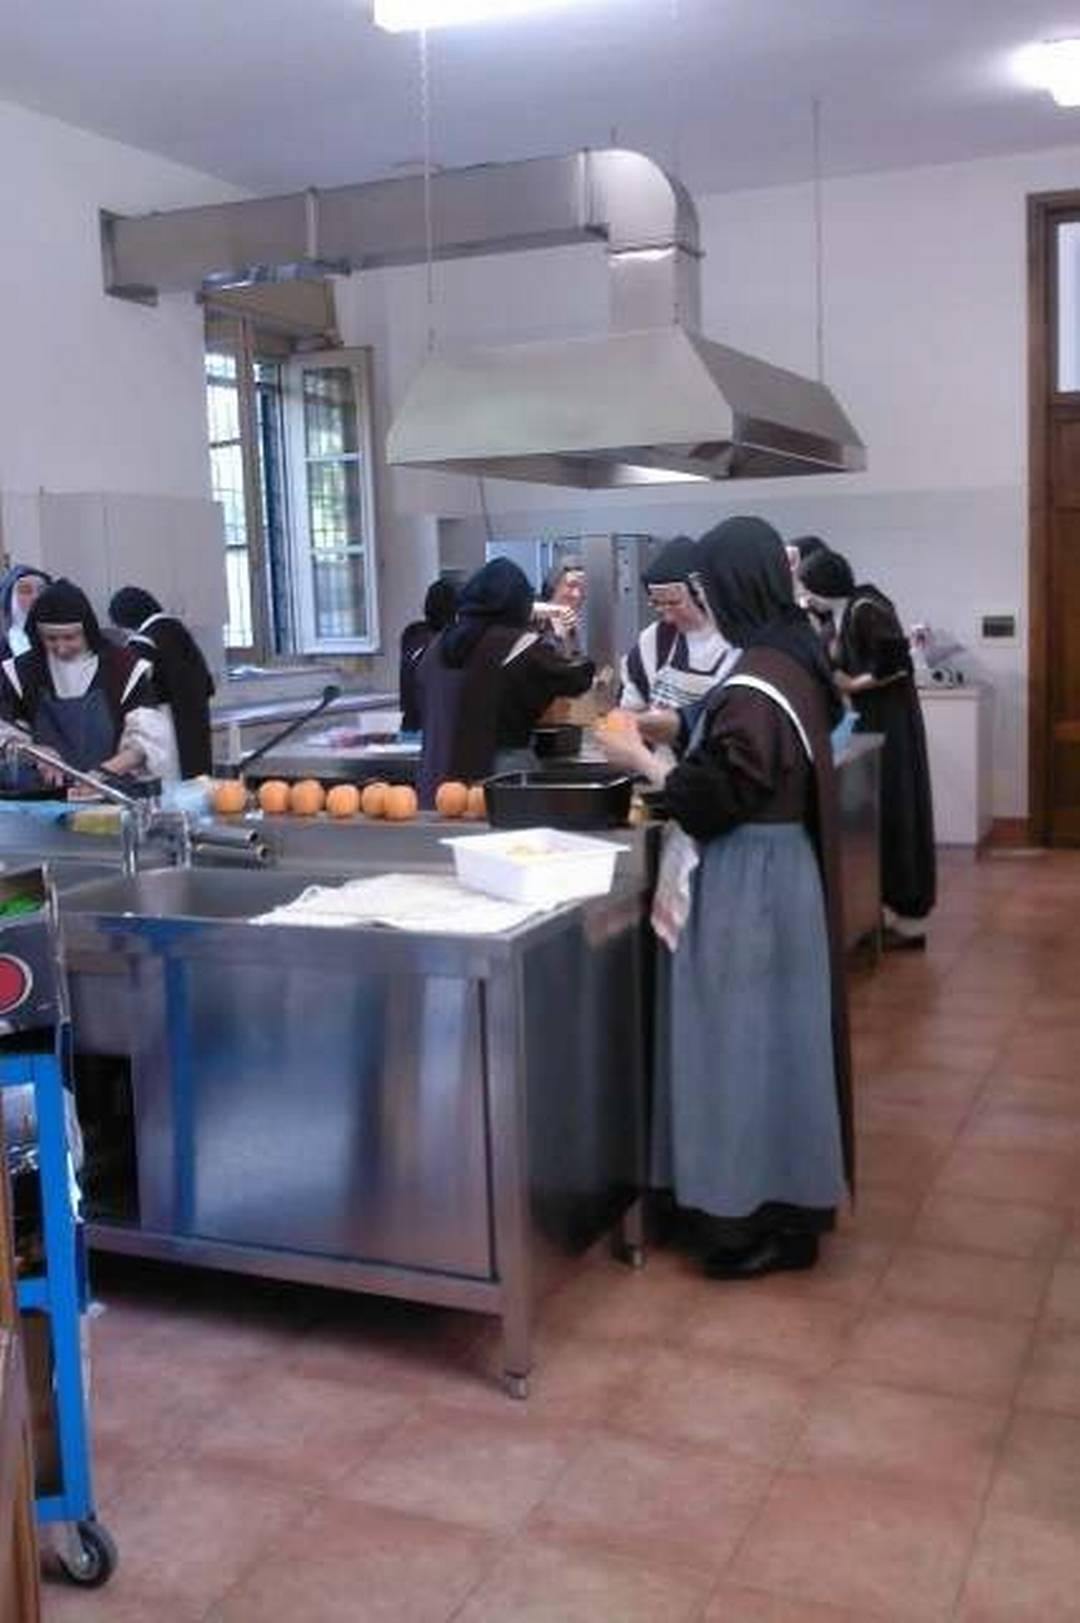 Cucina del monastero a Legnano